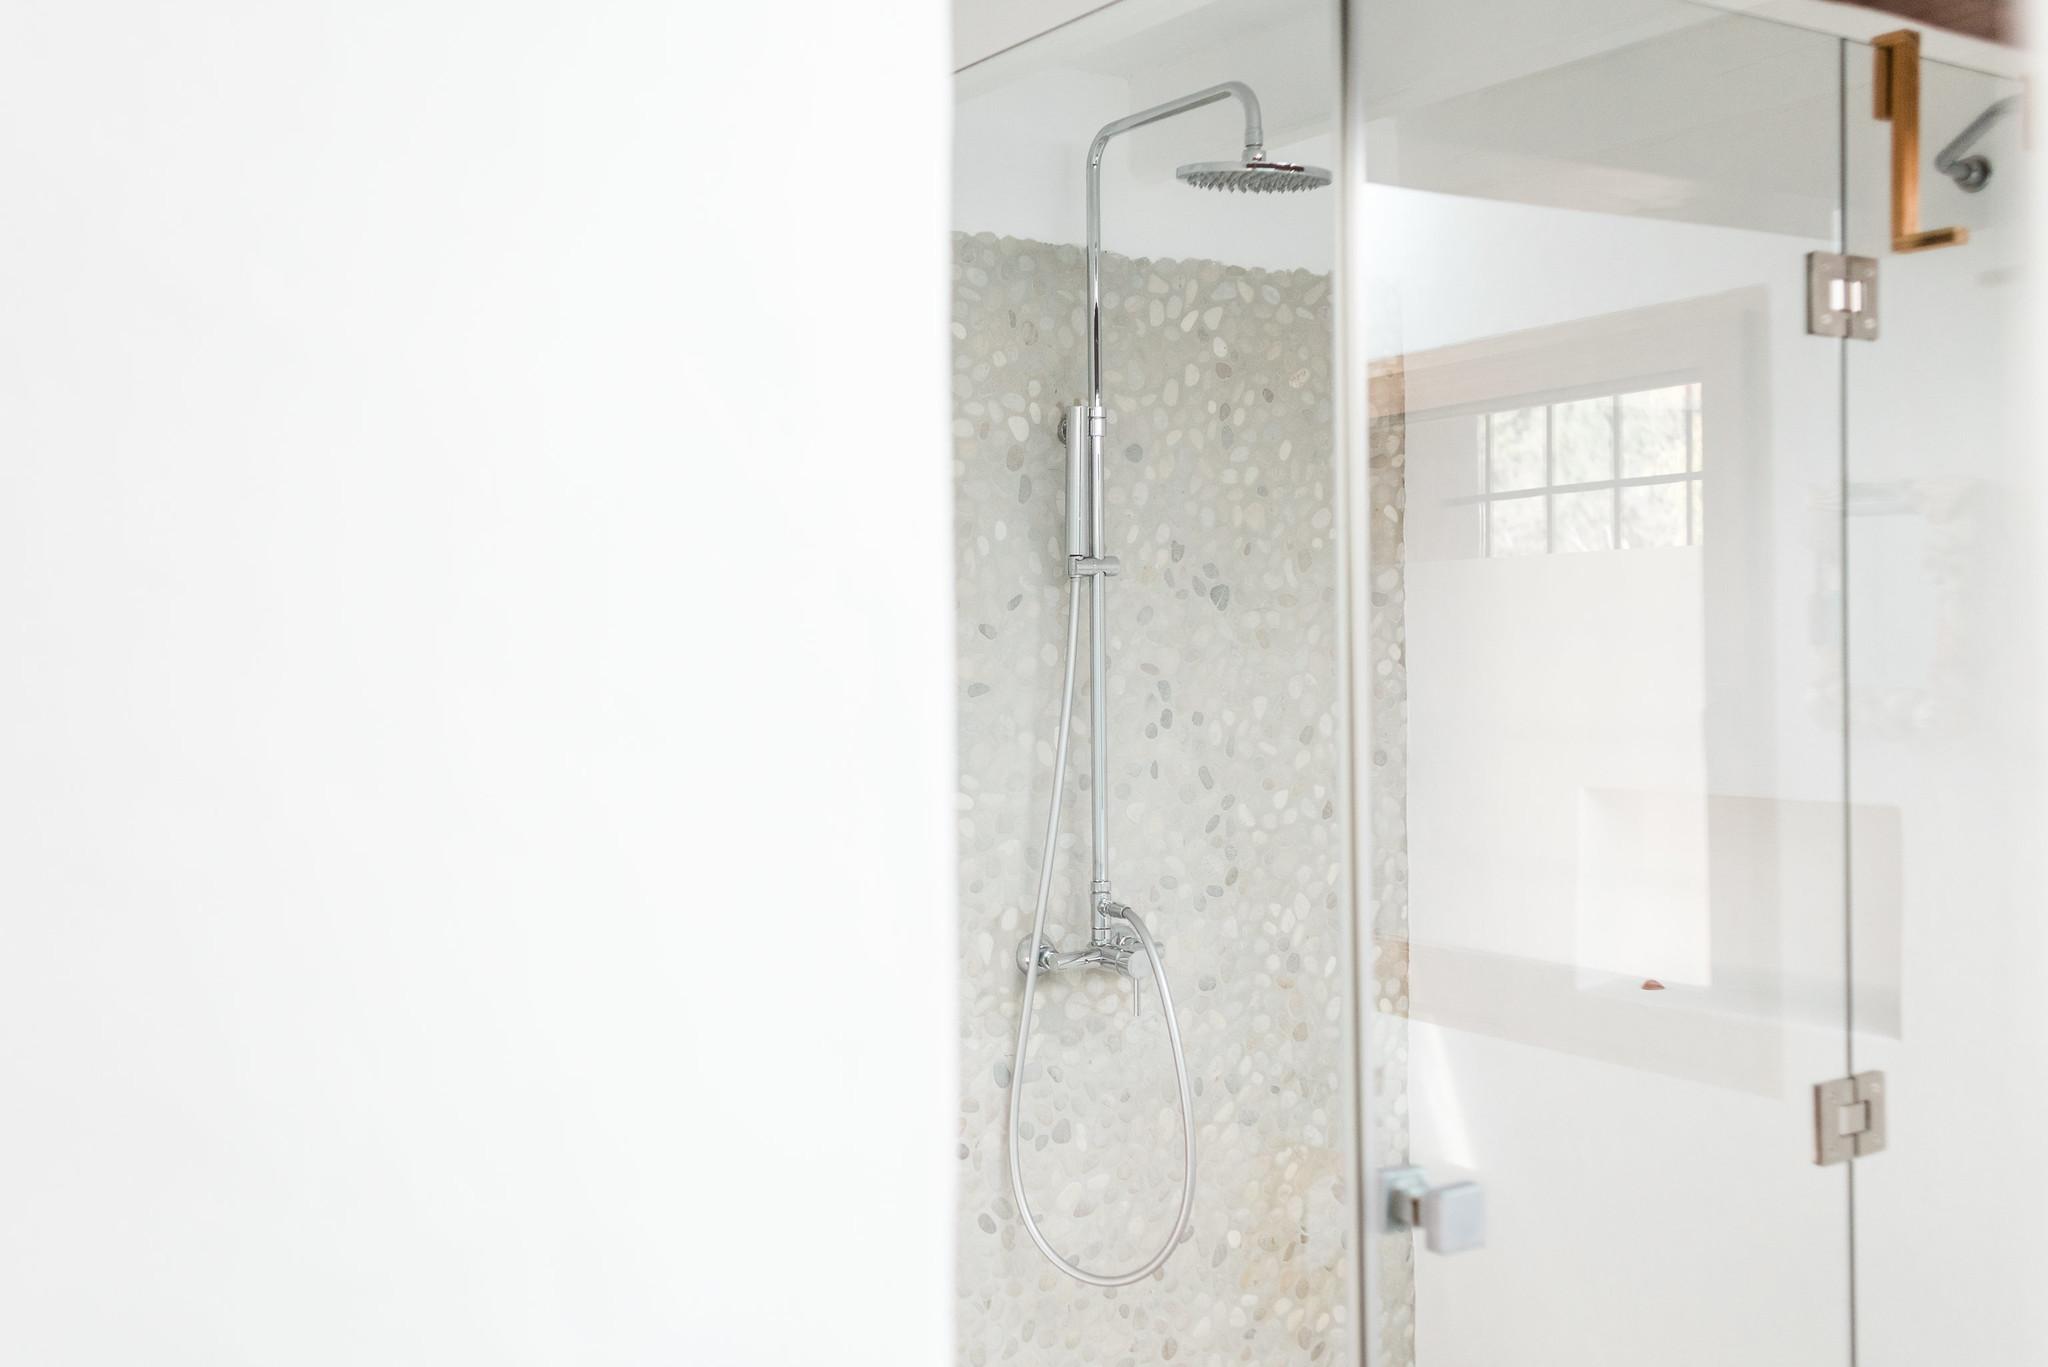 https://www.white-ibiza.com/wp-content/uploads/2020/06/white-ibiza-villas-villa-andrea-interior-shower.jpg